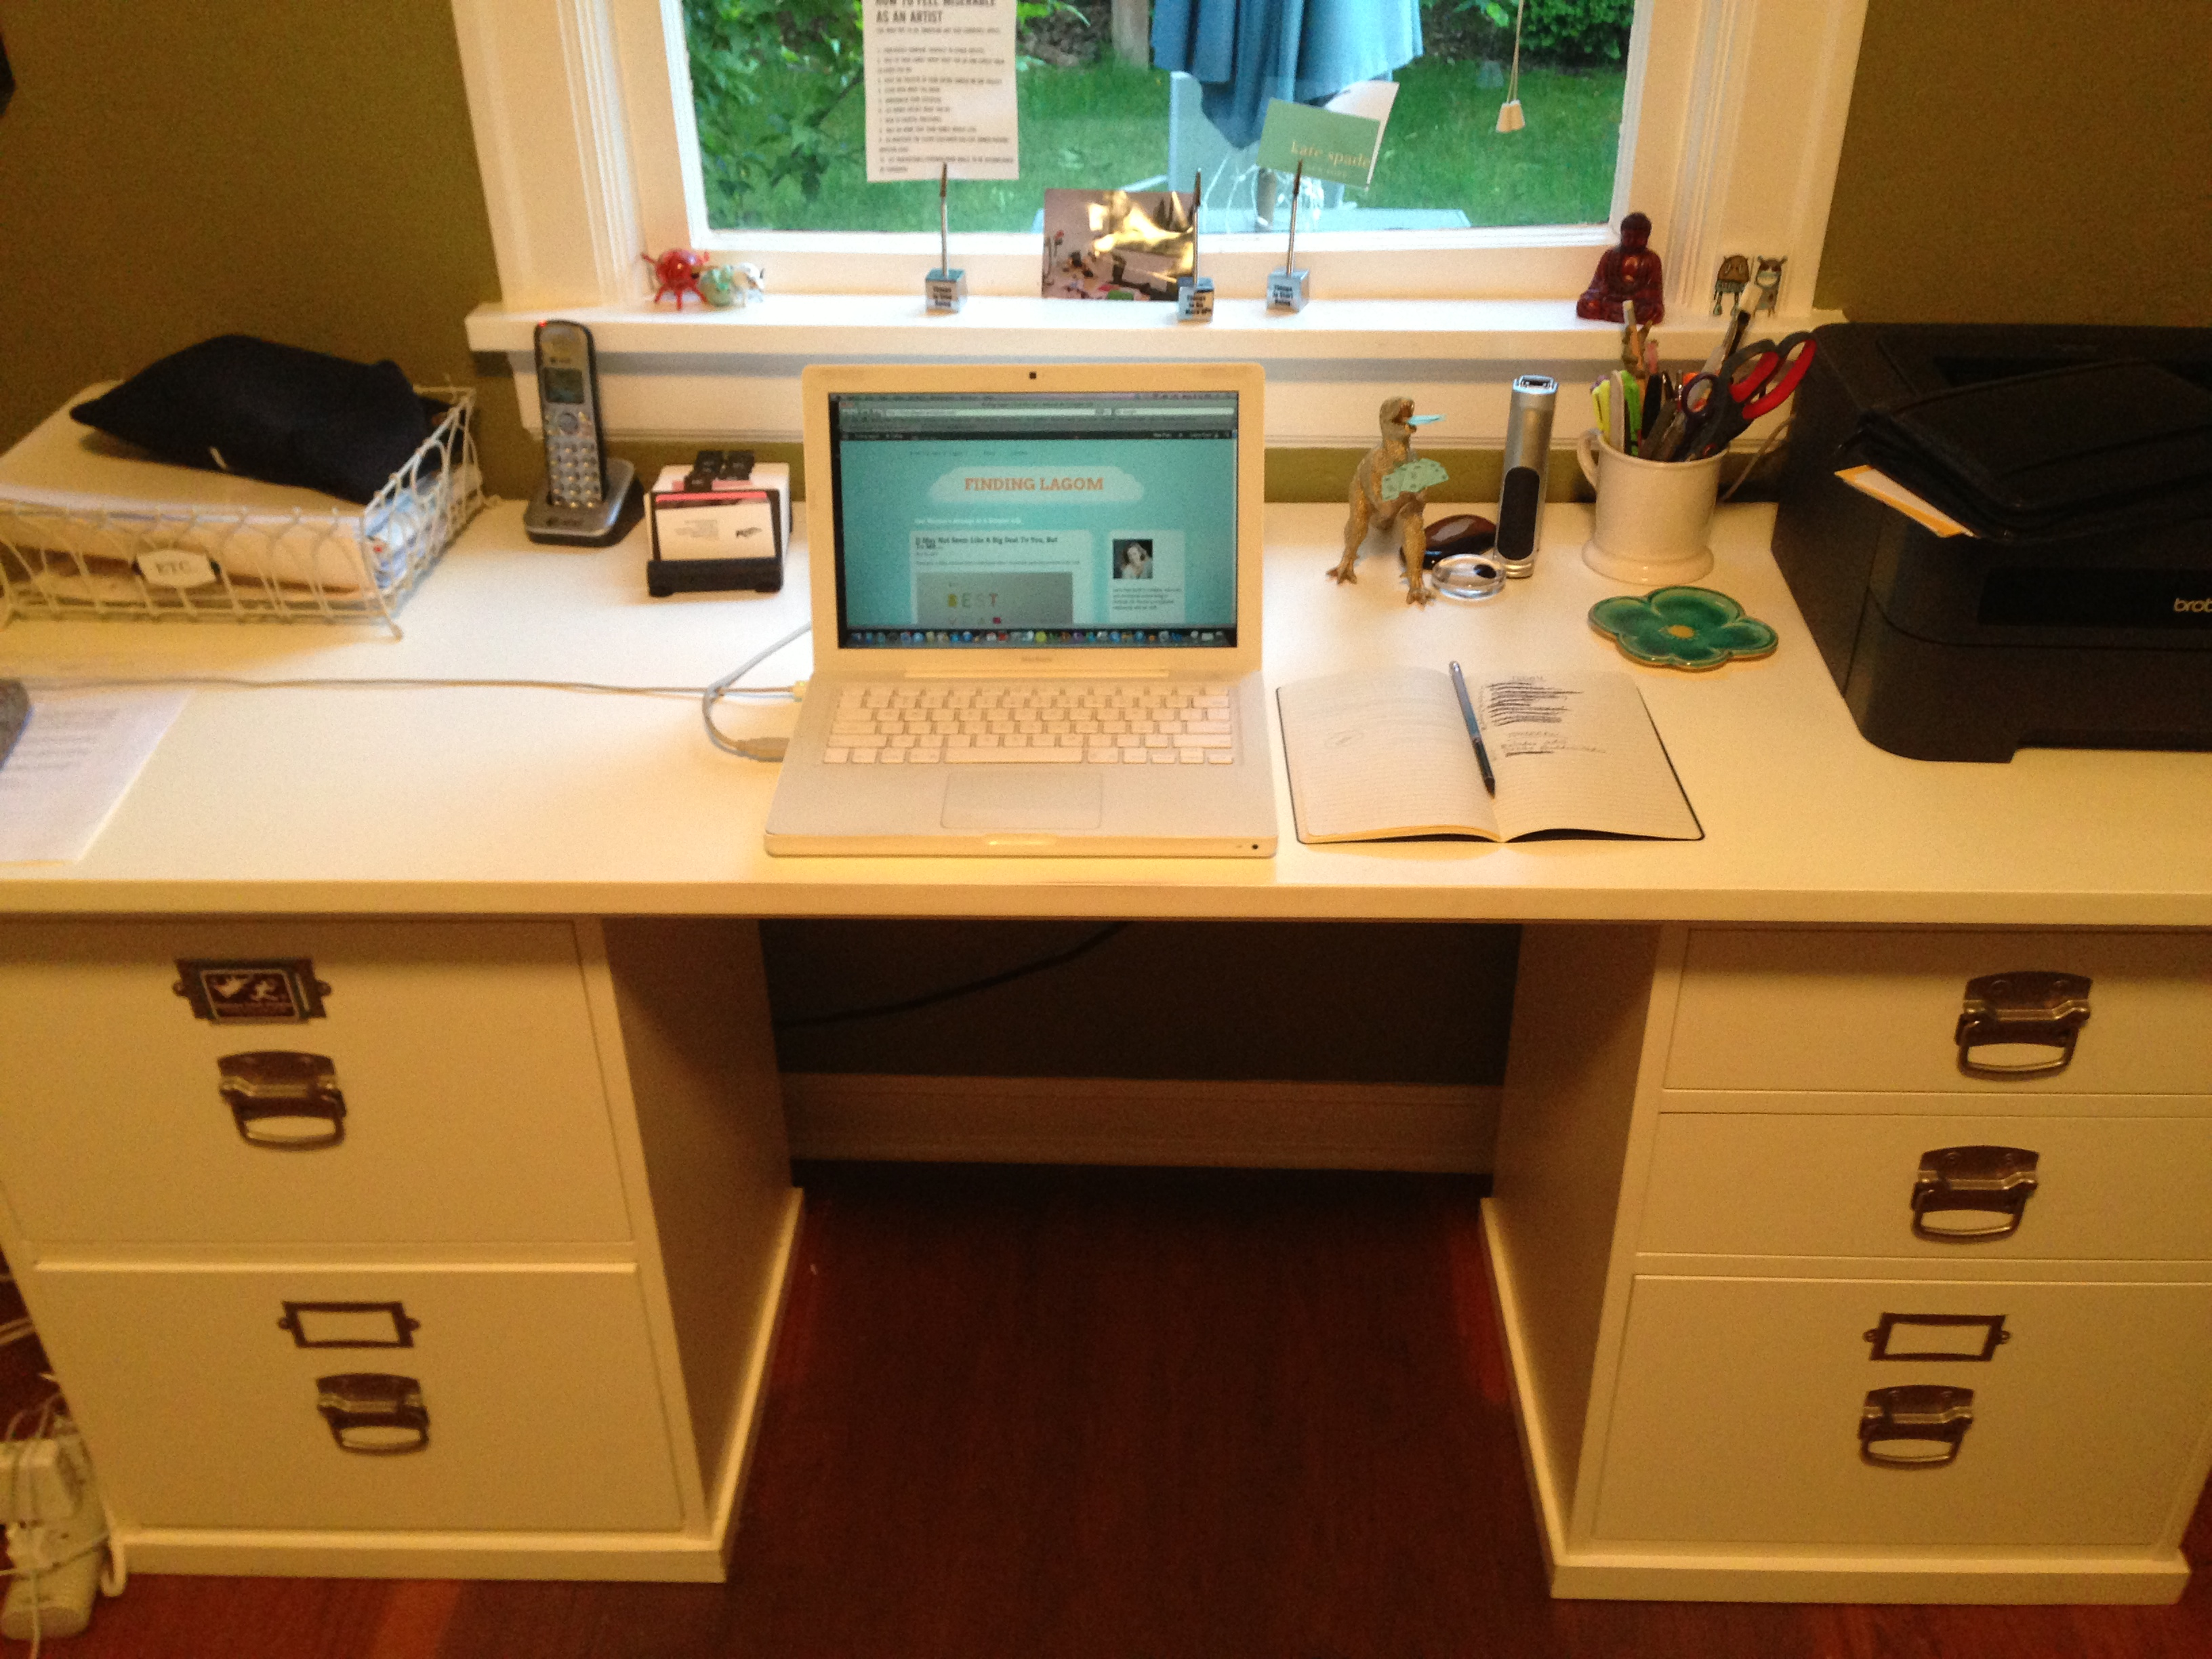 My Desk Is Clean My Desk Is Clean! My Desk Is Clean